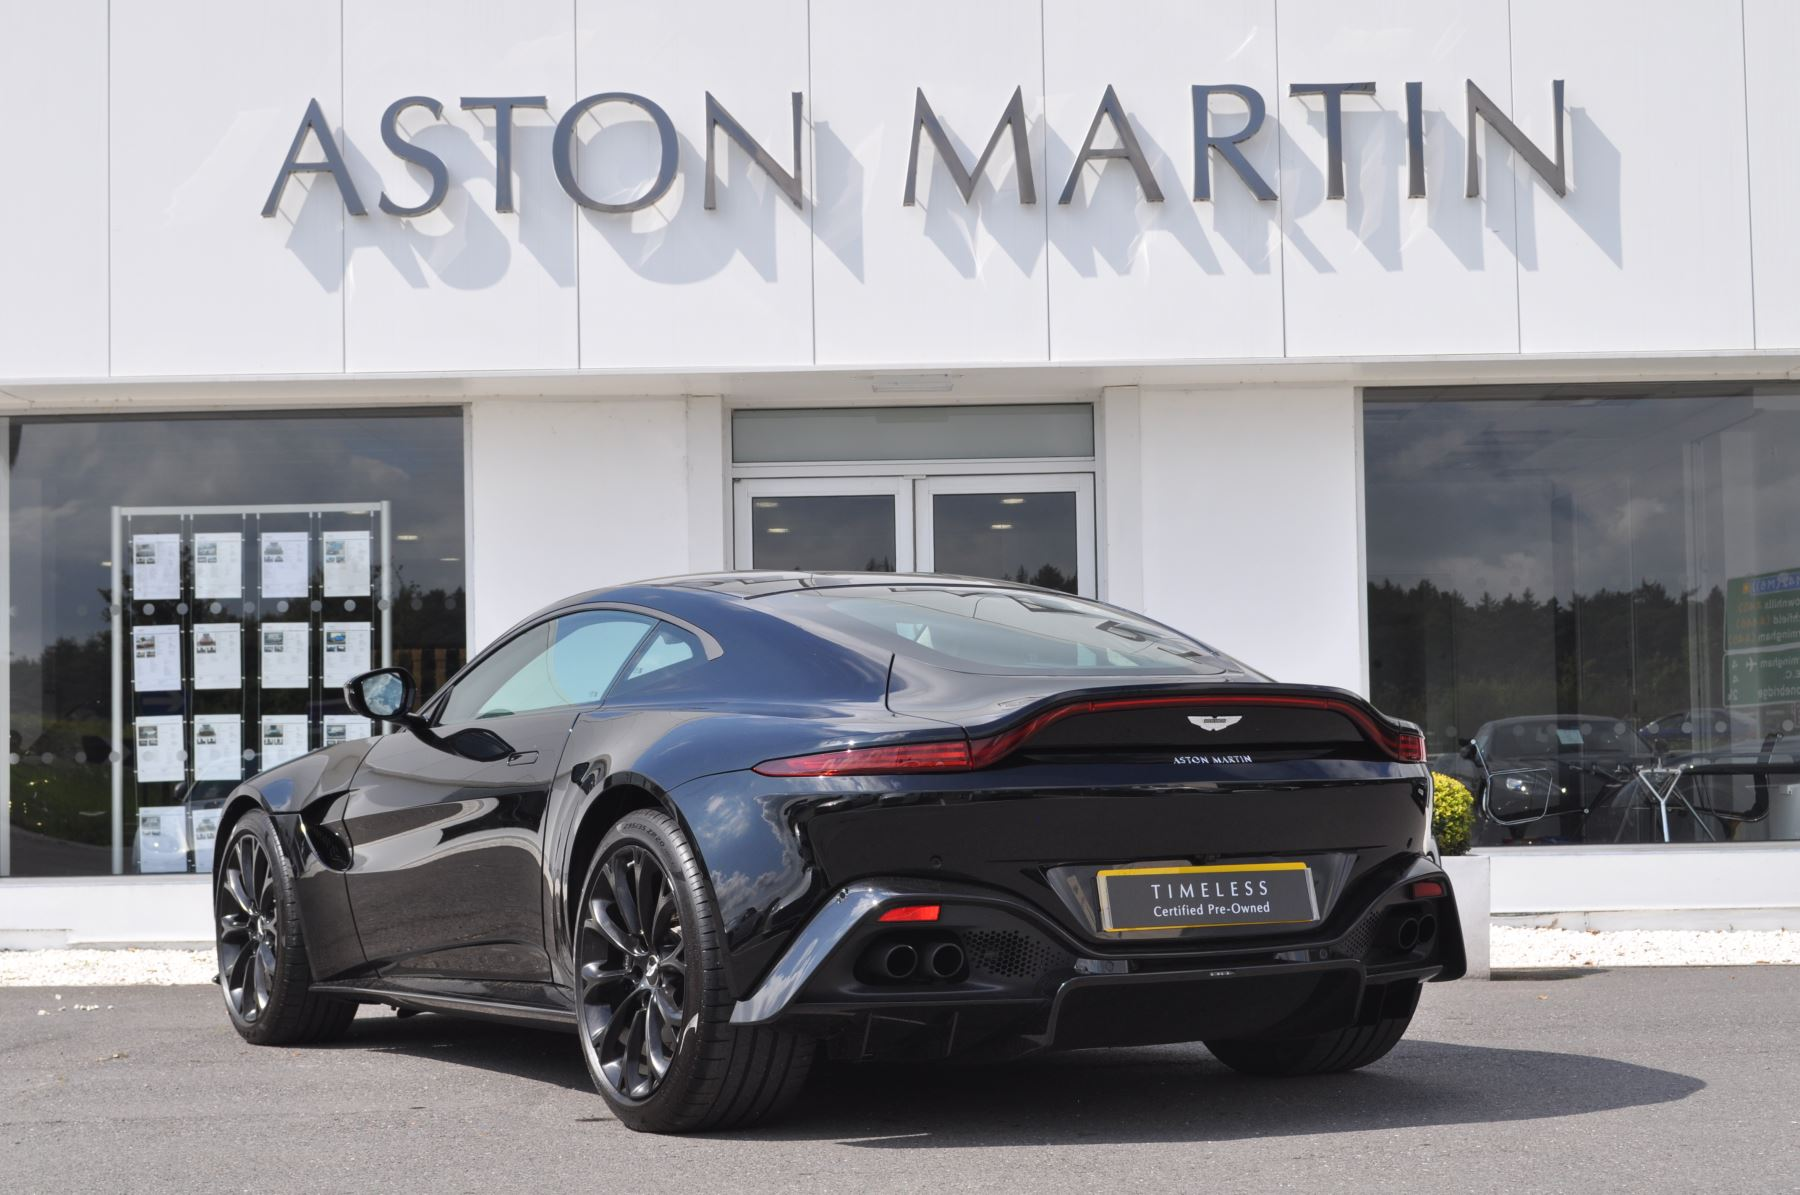 Aston Martin New Vantage 2dr ZF 8 Speed image 7